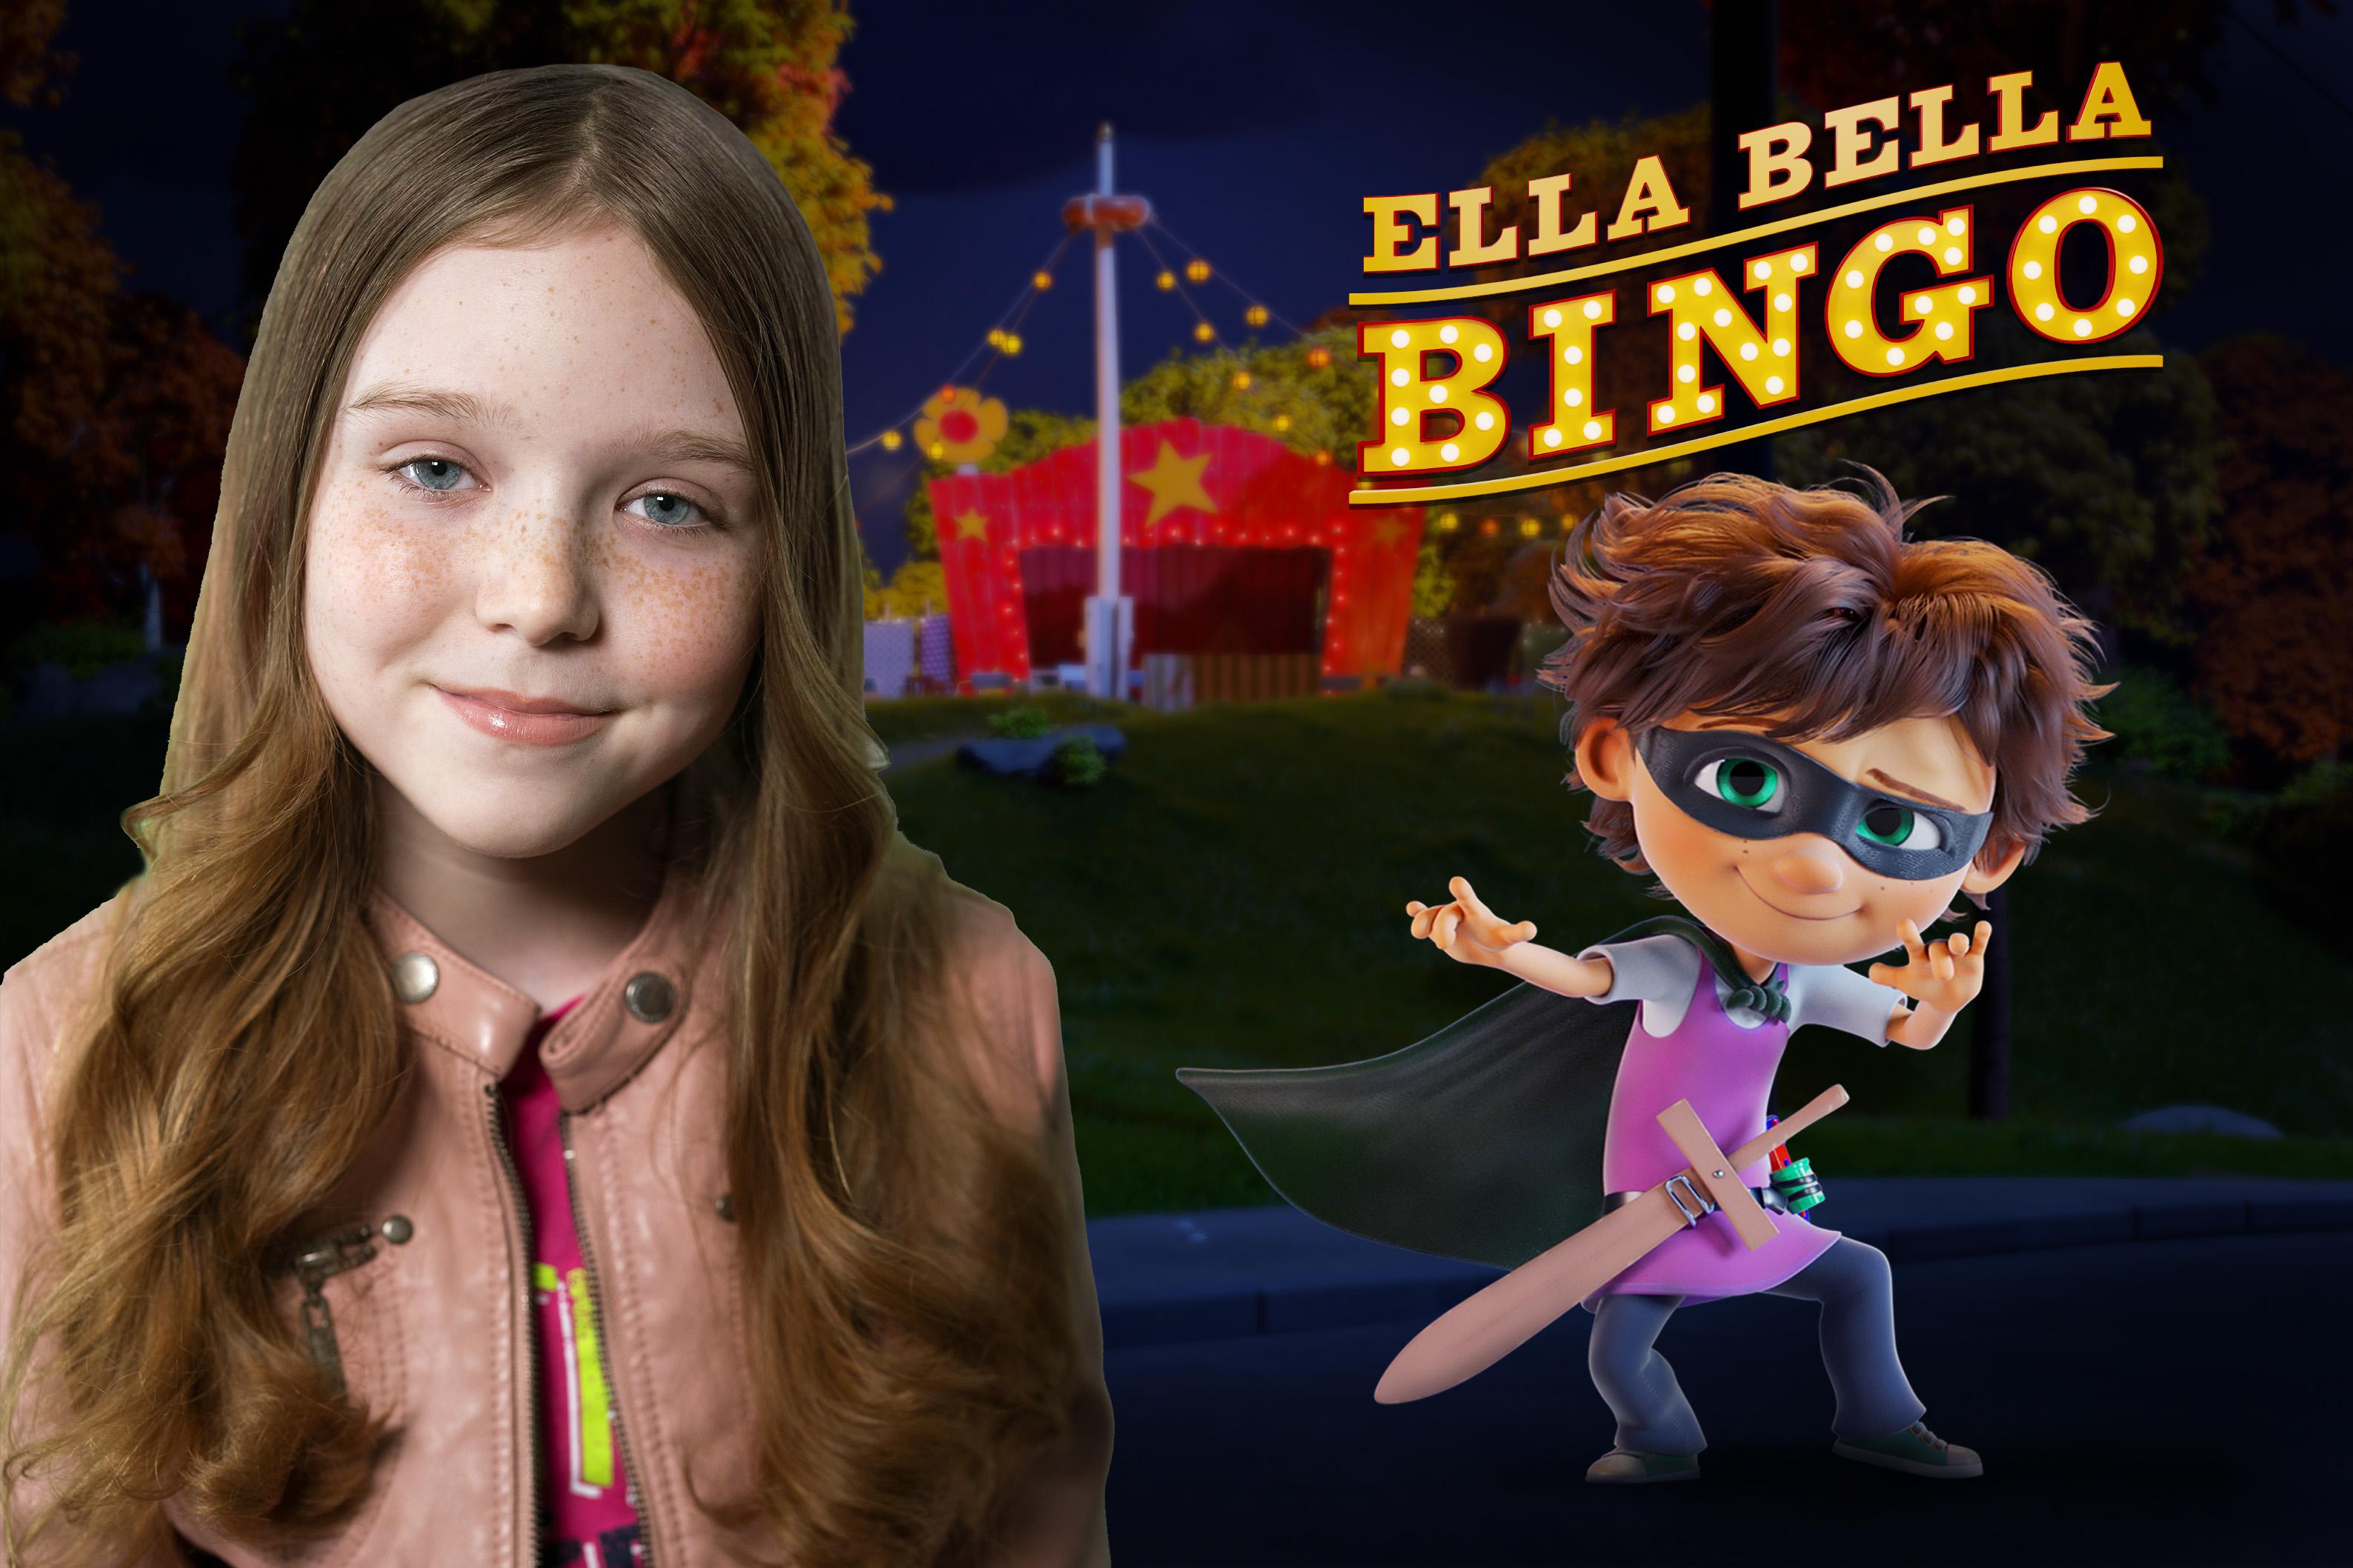 Studio 100 Film and Kool Produktion announce voice cast for Ella Bella Bingo